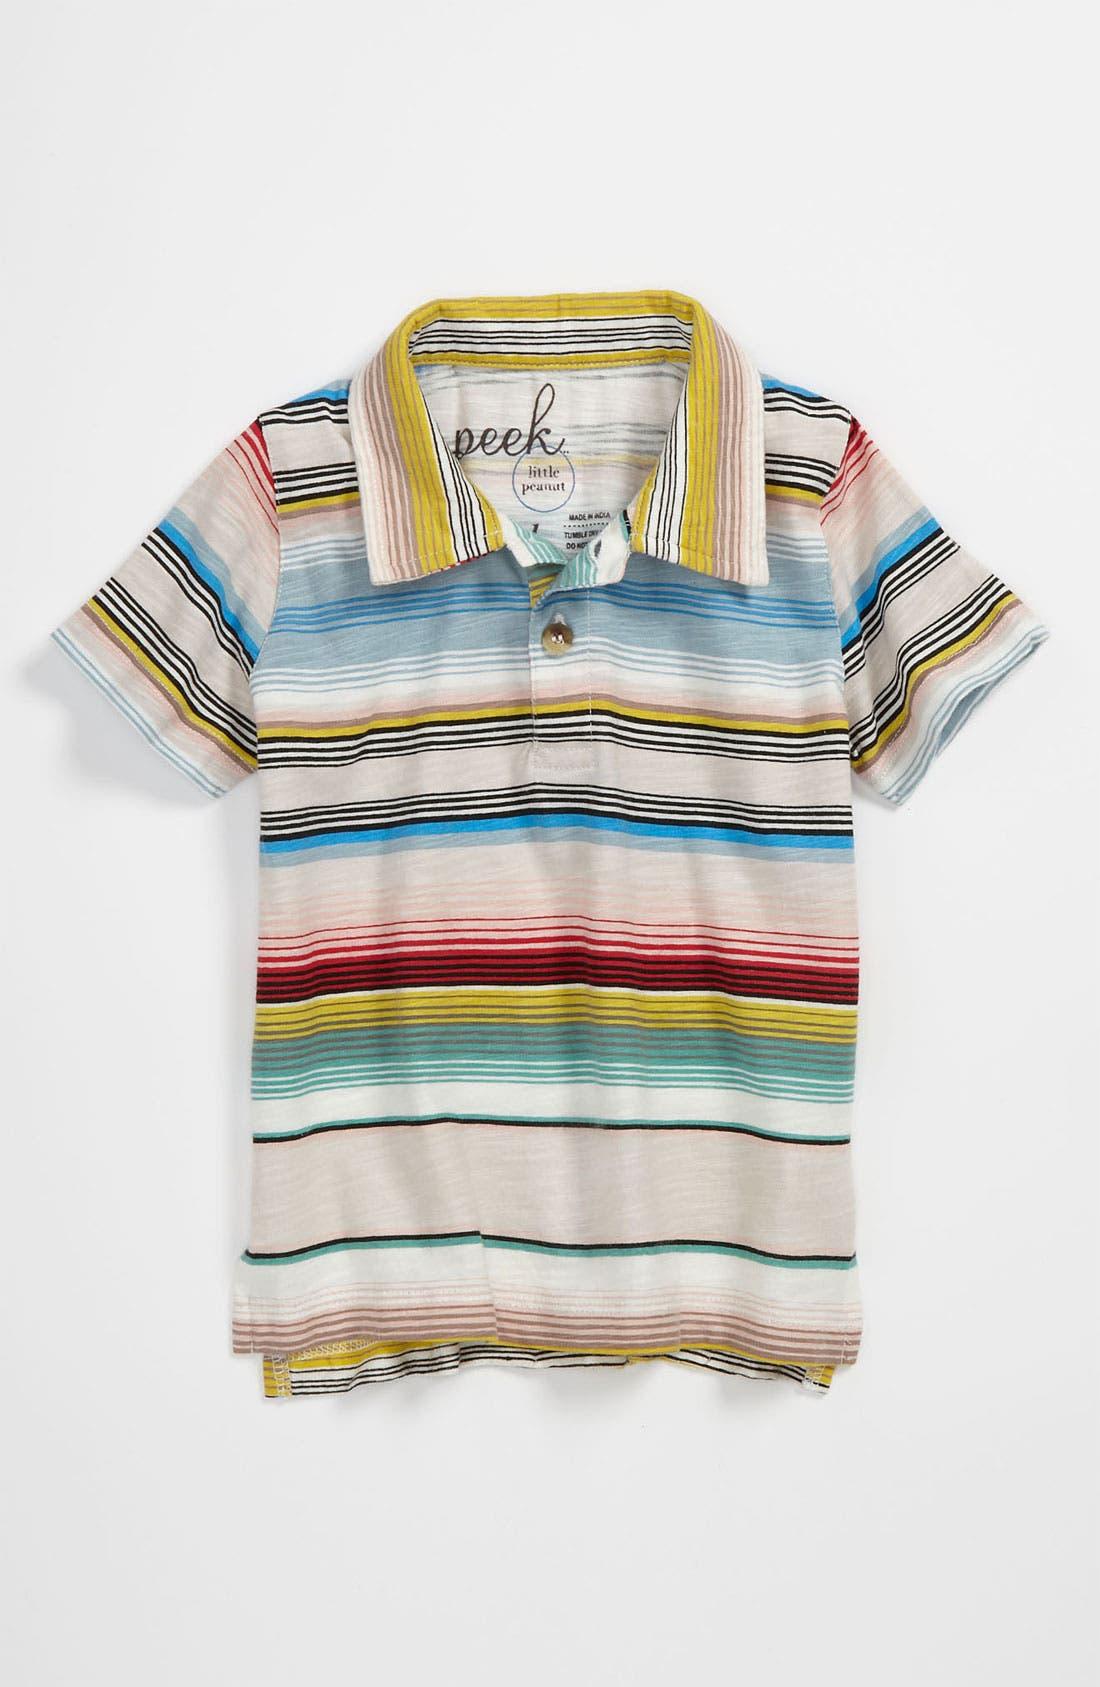 Alternate Image 1 Selected - Peek Stripe Polo Shirt (Baby)